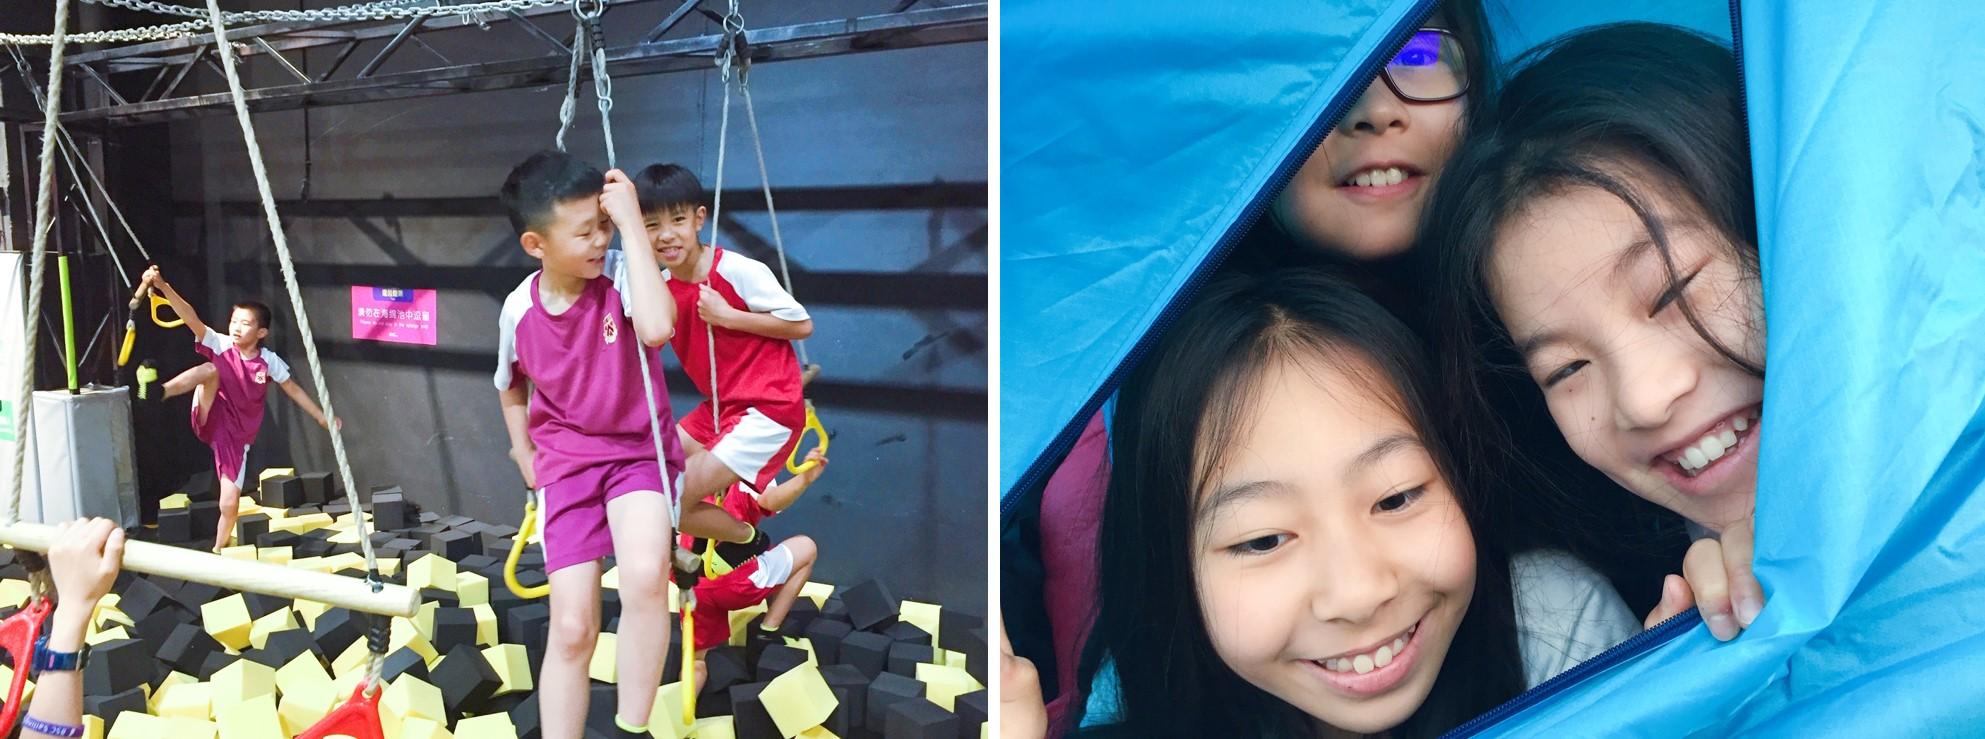 2019-dcb-year-4-residential-relaxing-and-camping-北京德威英国国际学校